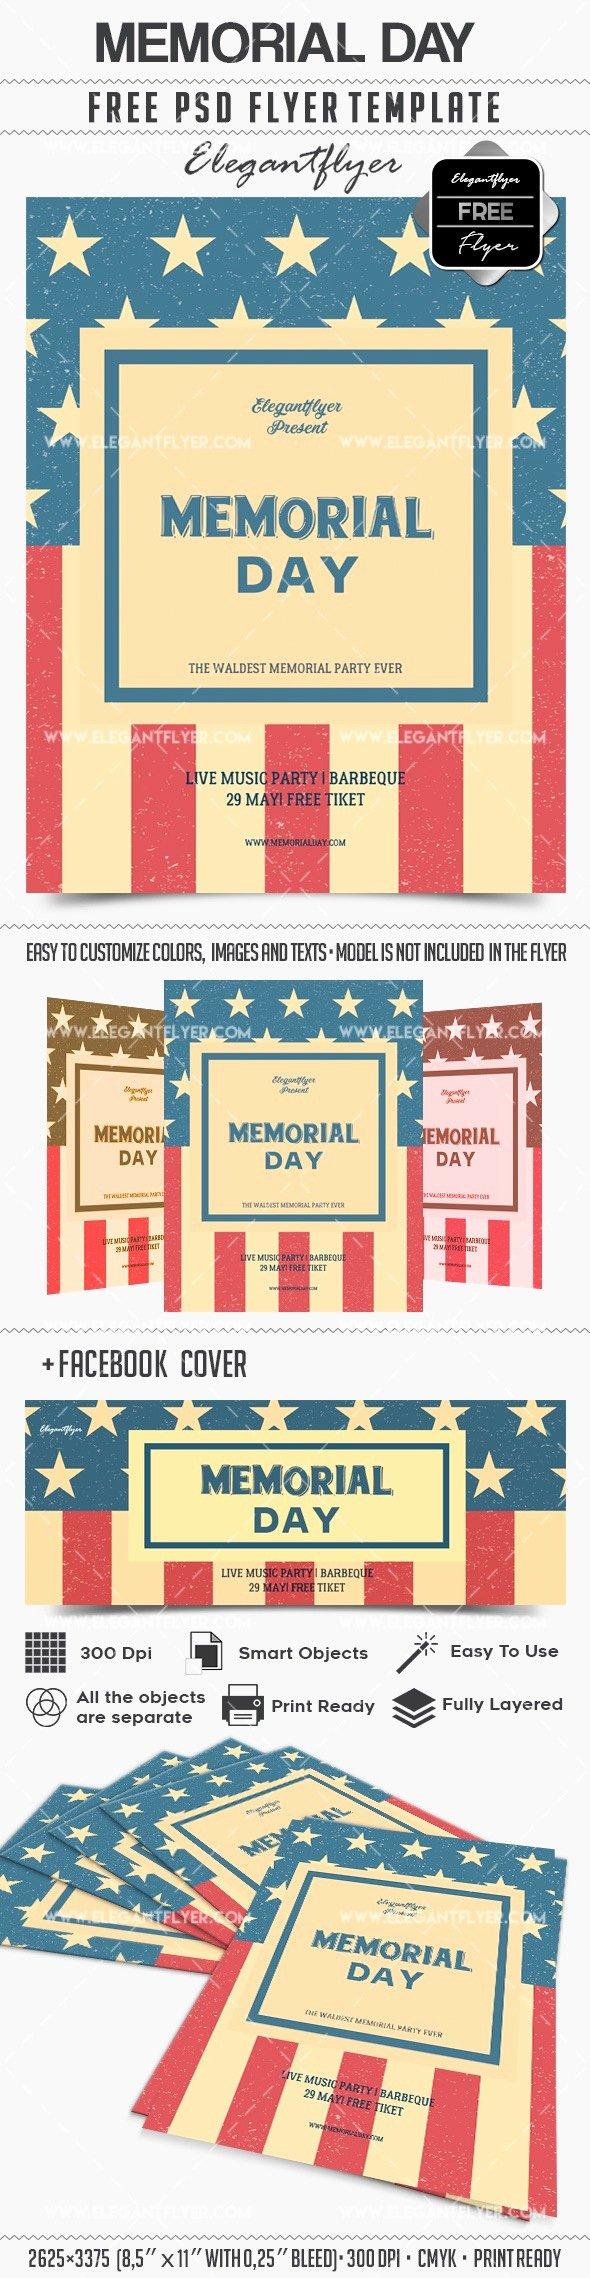 Memorial Day Flyer Template Free New Memorial Day – Free Flyer Psd Template – by Elegantflyer